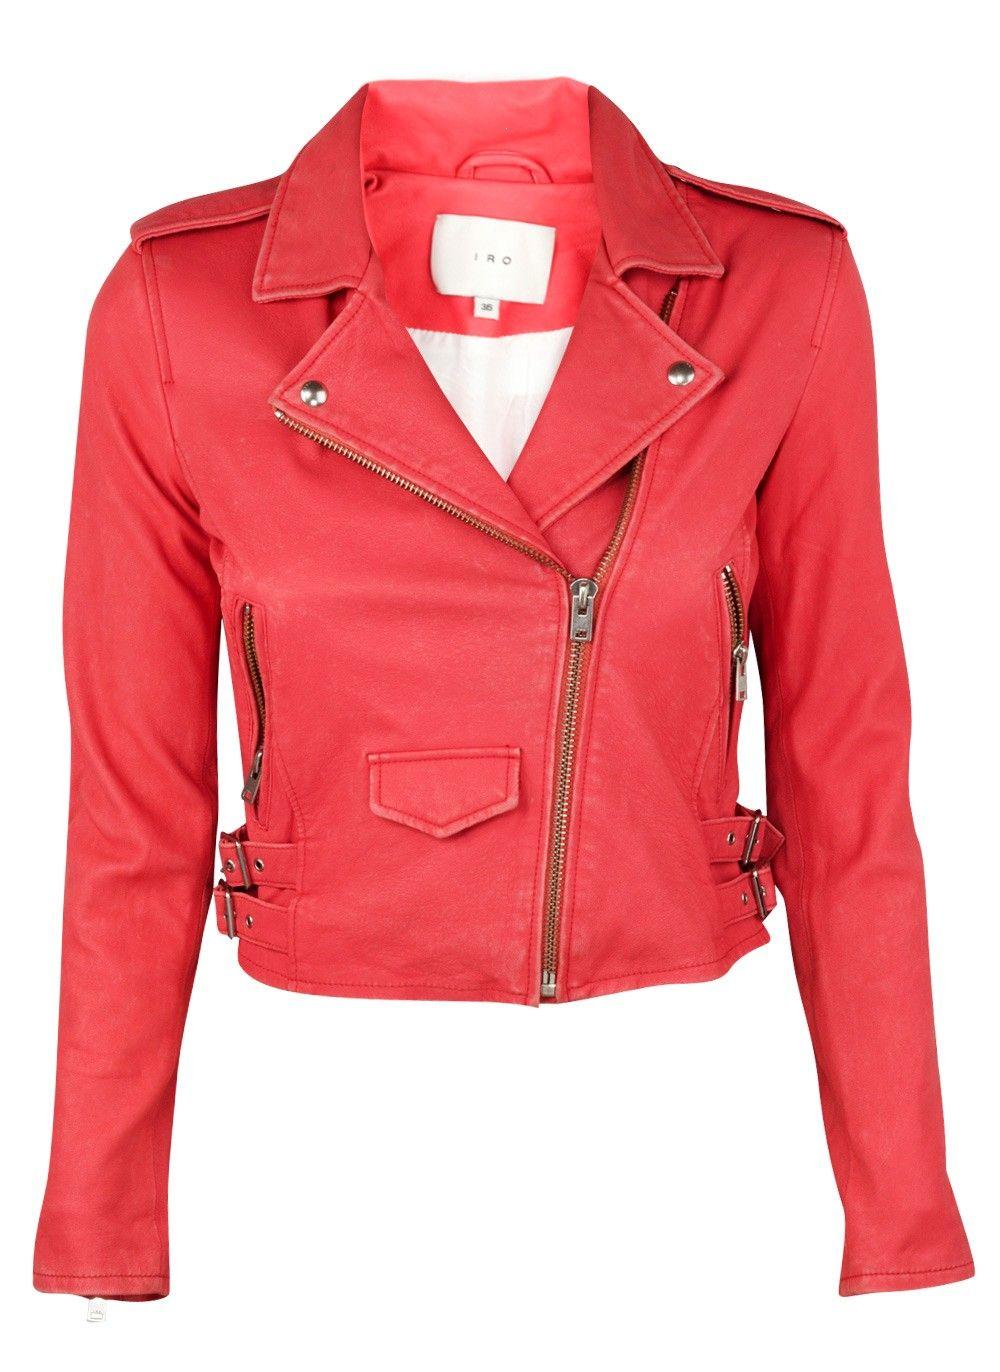 Ashville Coral Pink Leather Jacket Red Crop Jacket Pink Leather Jacket Coral Leather Jacket [ 1372 x 1000 Pixel ]